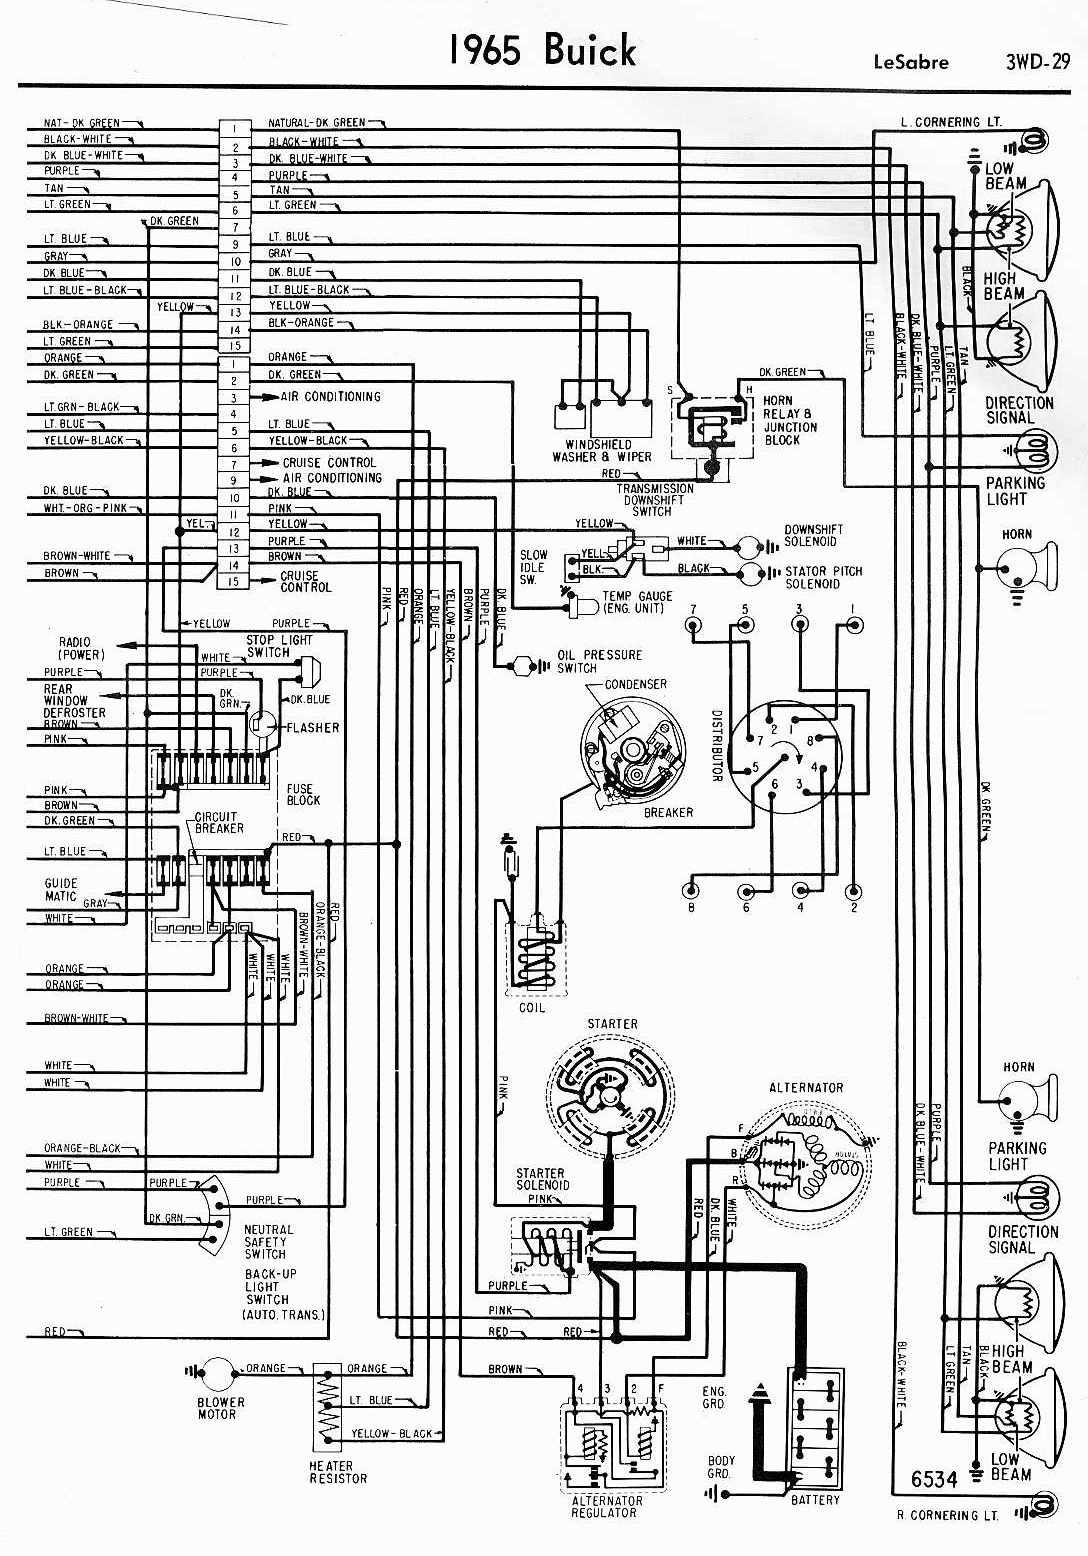 1990 buick lesabre wiring diagram trusted wiring diagram rh 12 nl schoenheitsbrieftaube de 2000 buick lesabre heater location 2001 buick lesabre wiring  [ 1088 x 1556 Pixel ]